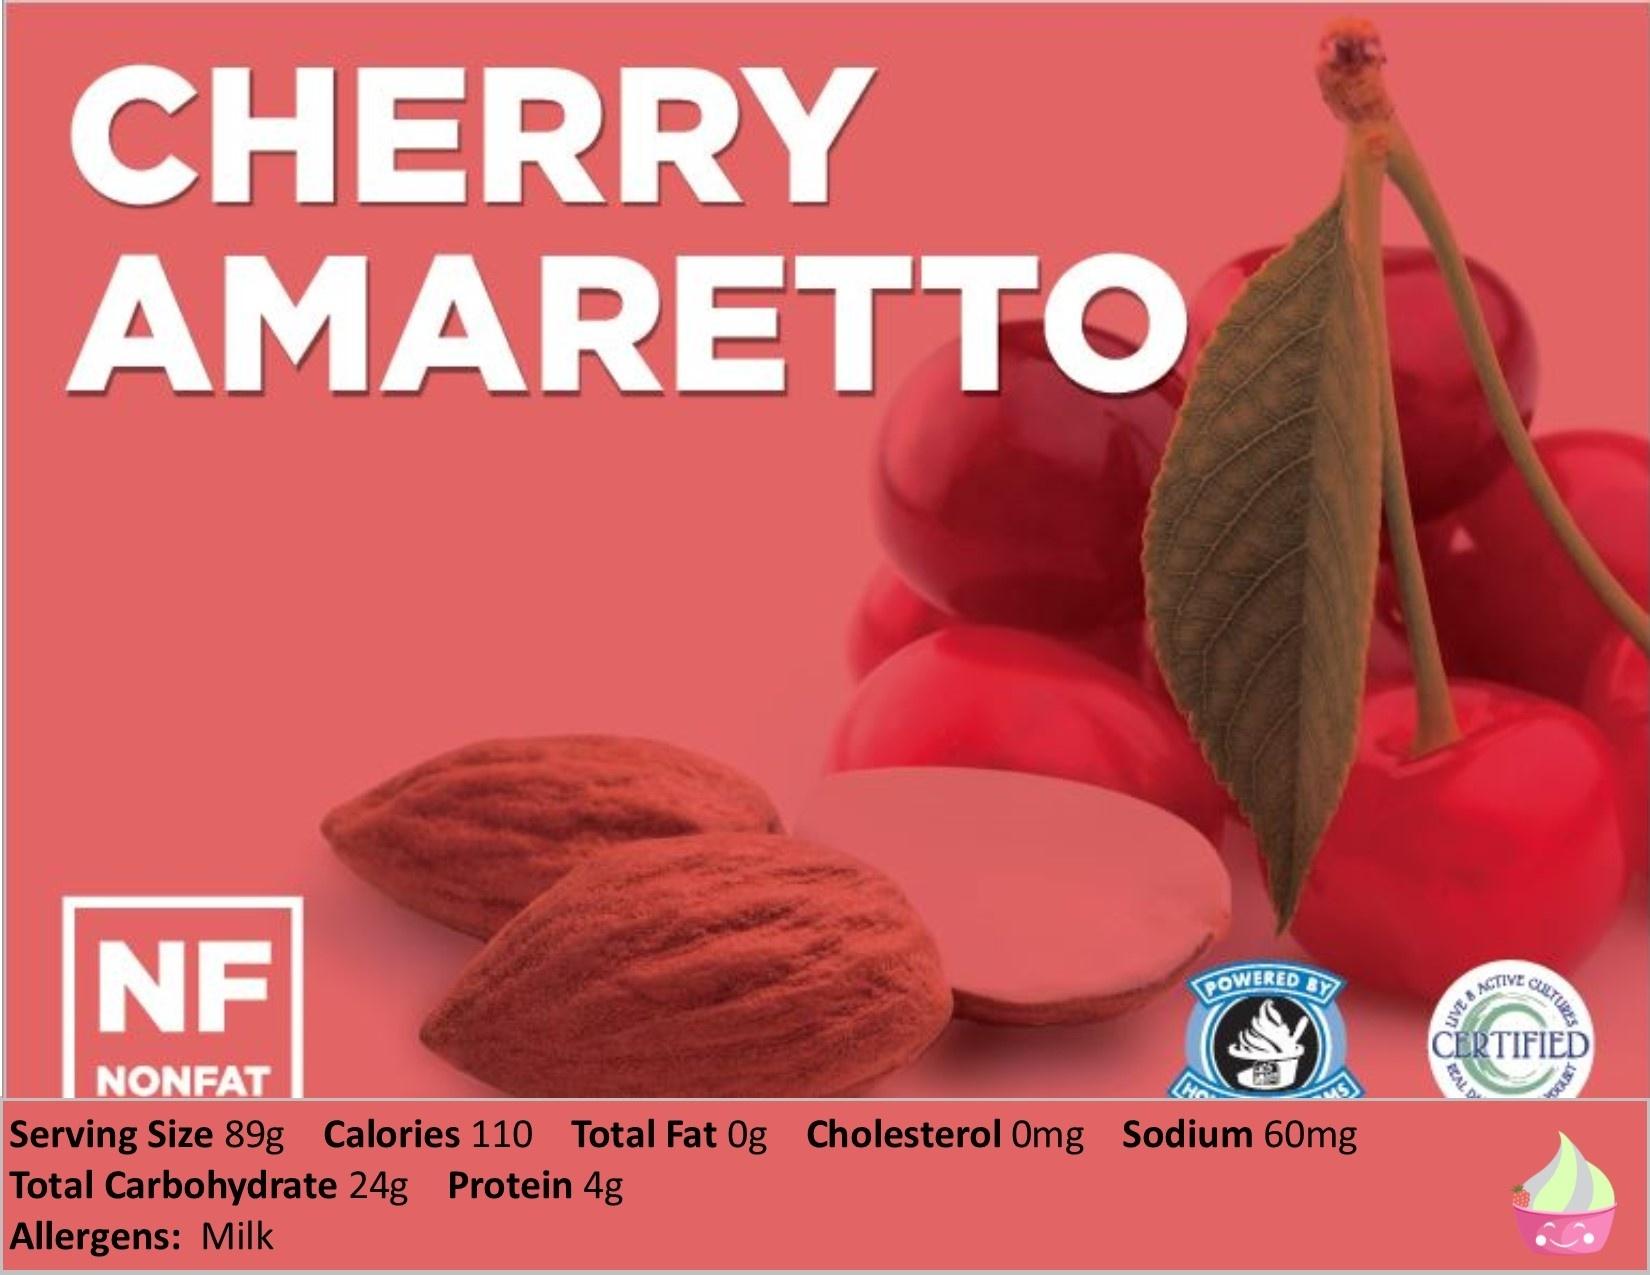 https://0201.nccdn.net/1_2/000/000/173/7f1/Cherry-Amaretto-NF-1650x1275-1650x1275.jpg